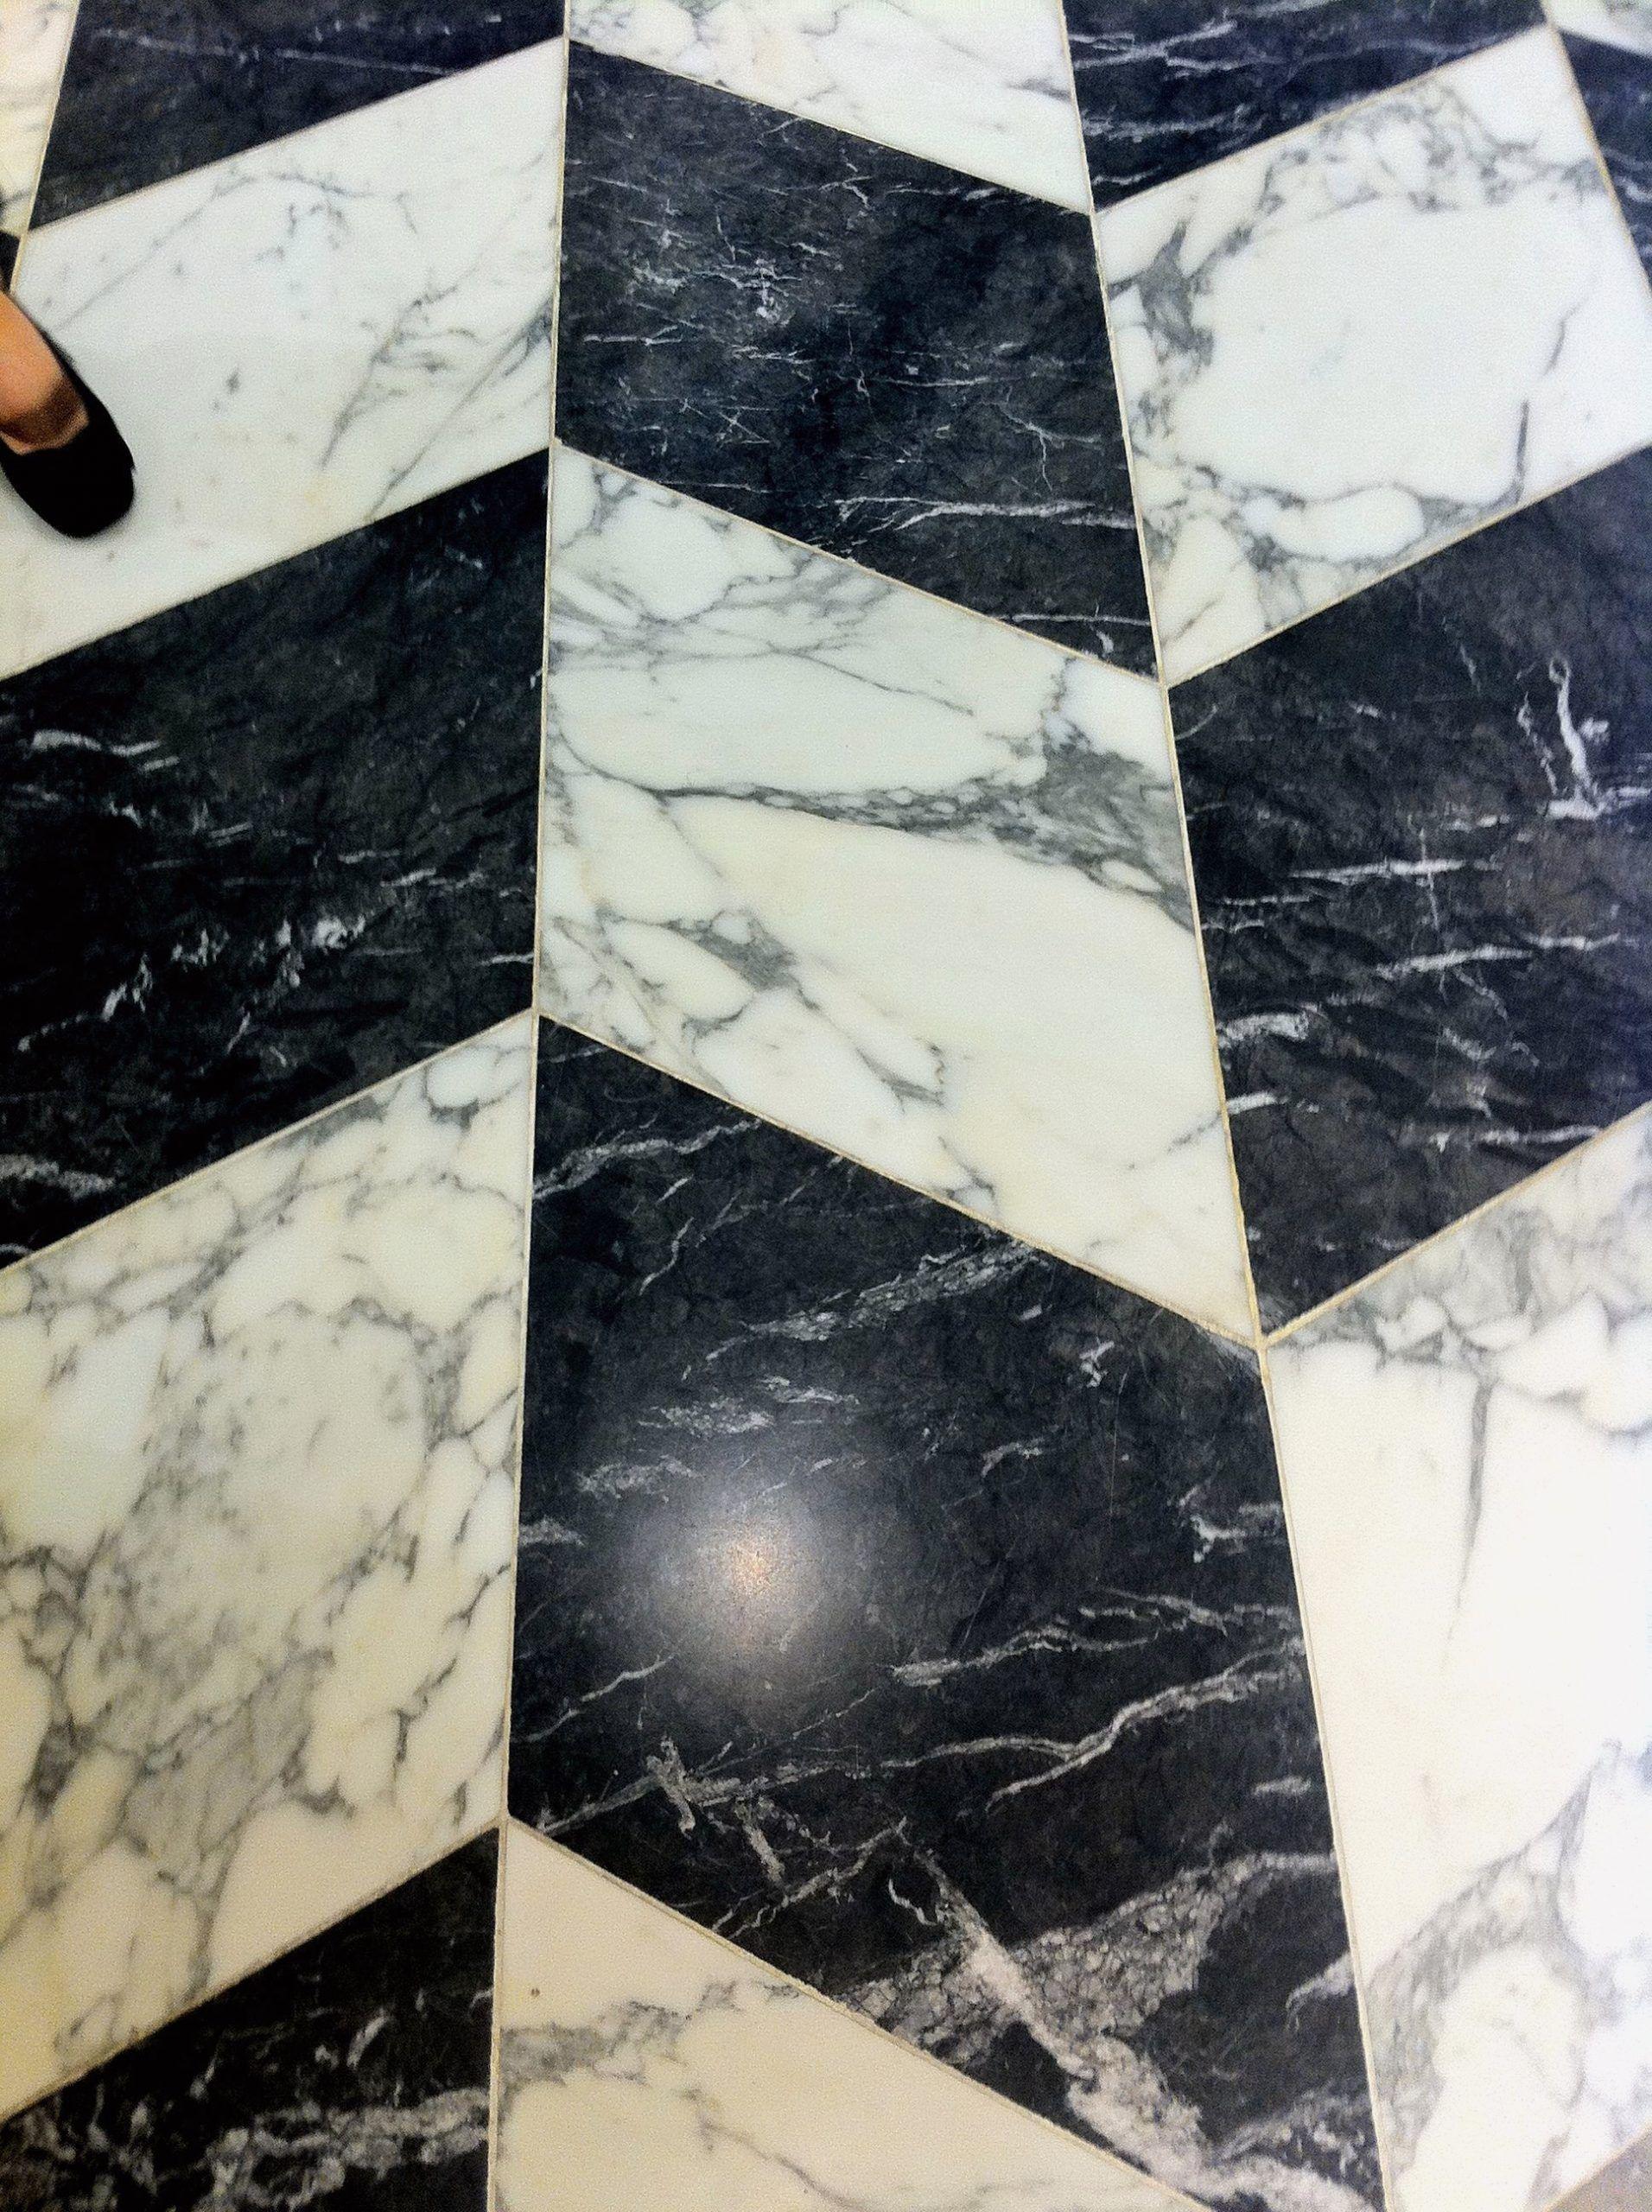 15 Sunny White Marble Floor Design   Marble Floor, Marble Floor Pattern, Floor Design